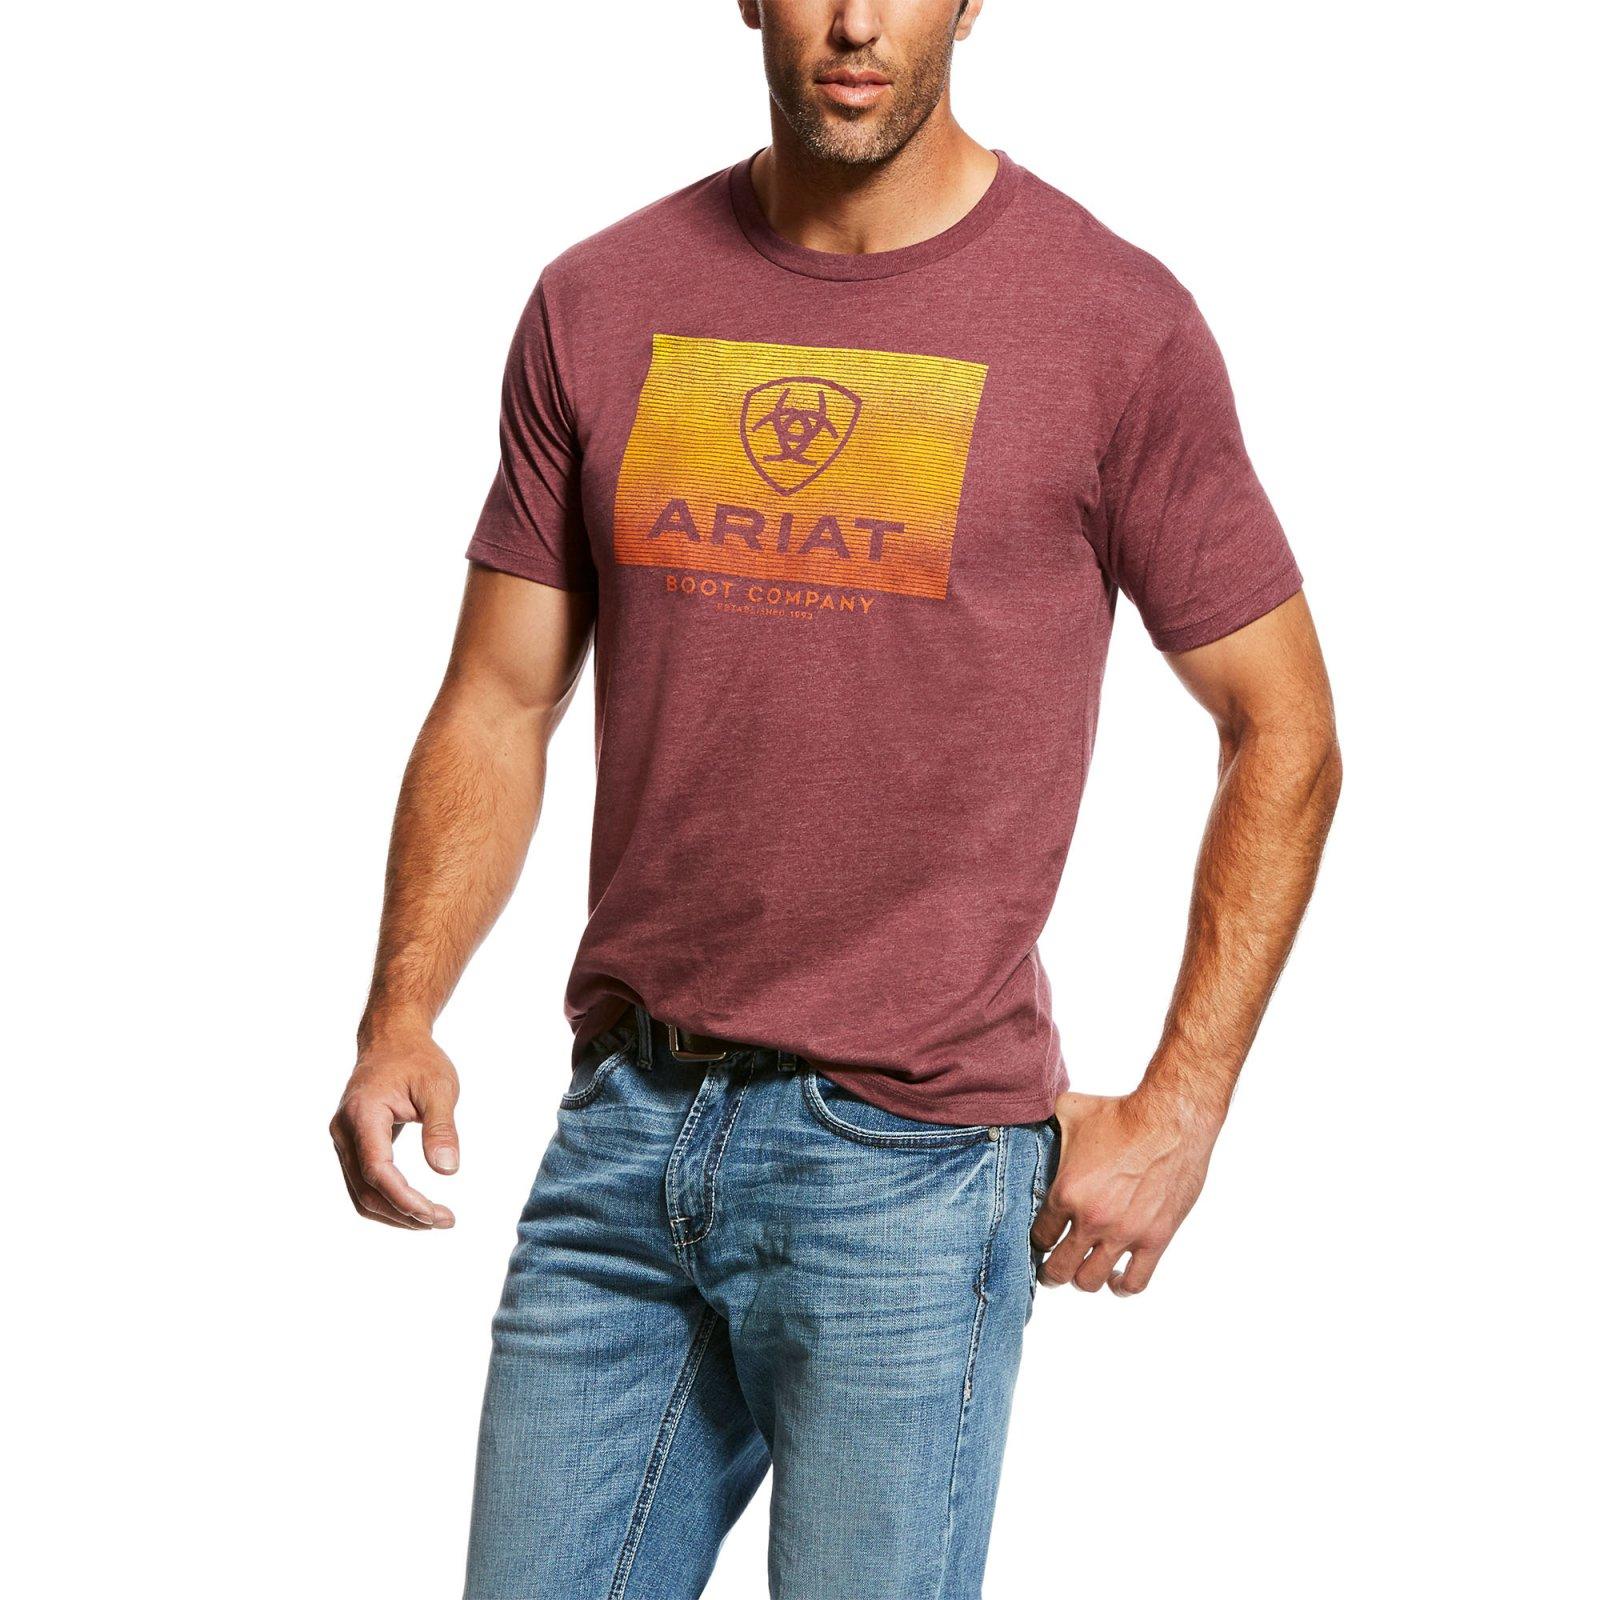 Men's Short Sleeve Gradient T-Shirt from Ariat